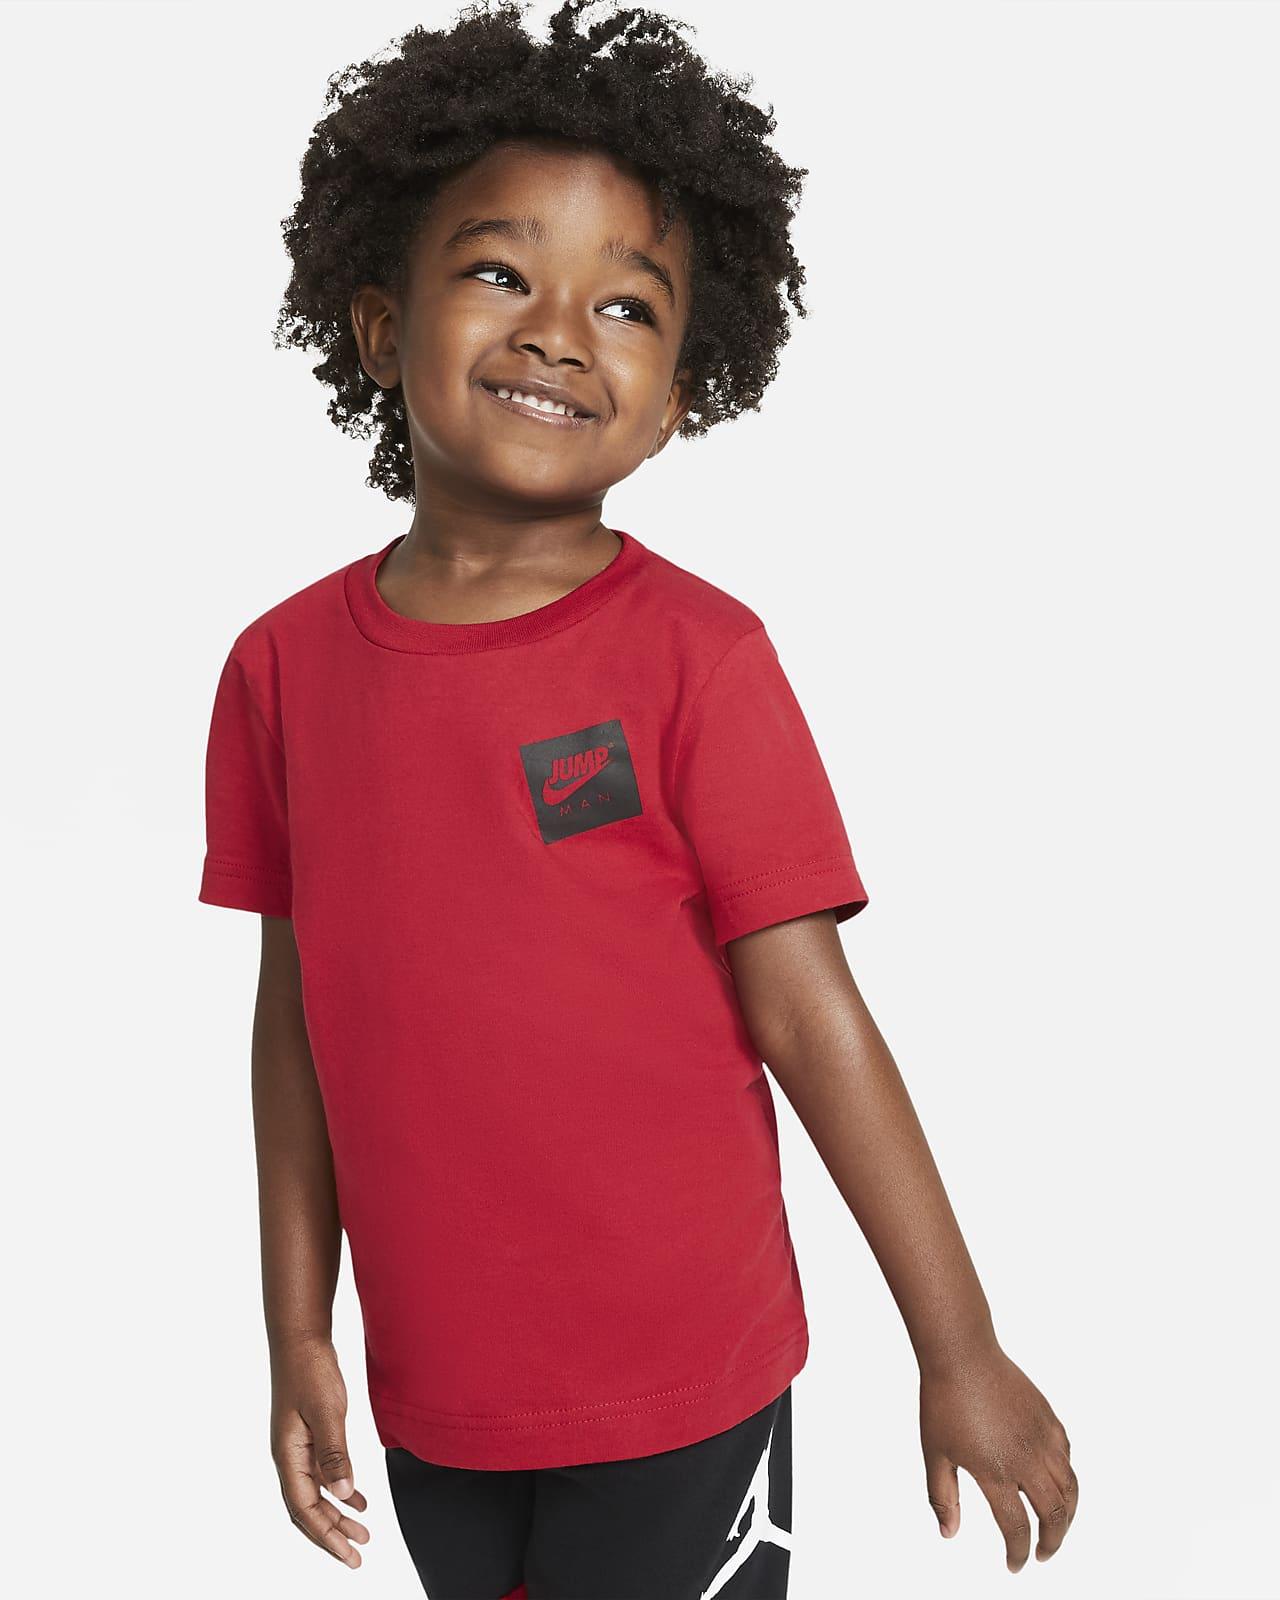 Jordan Jumpman Toddler T-Shirt